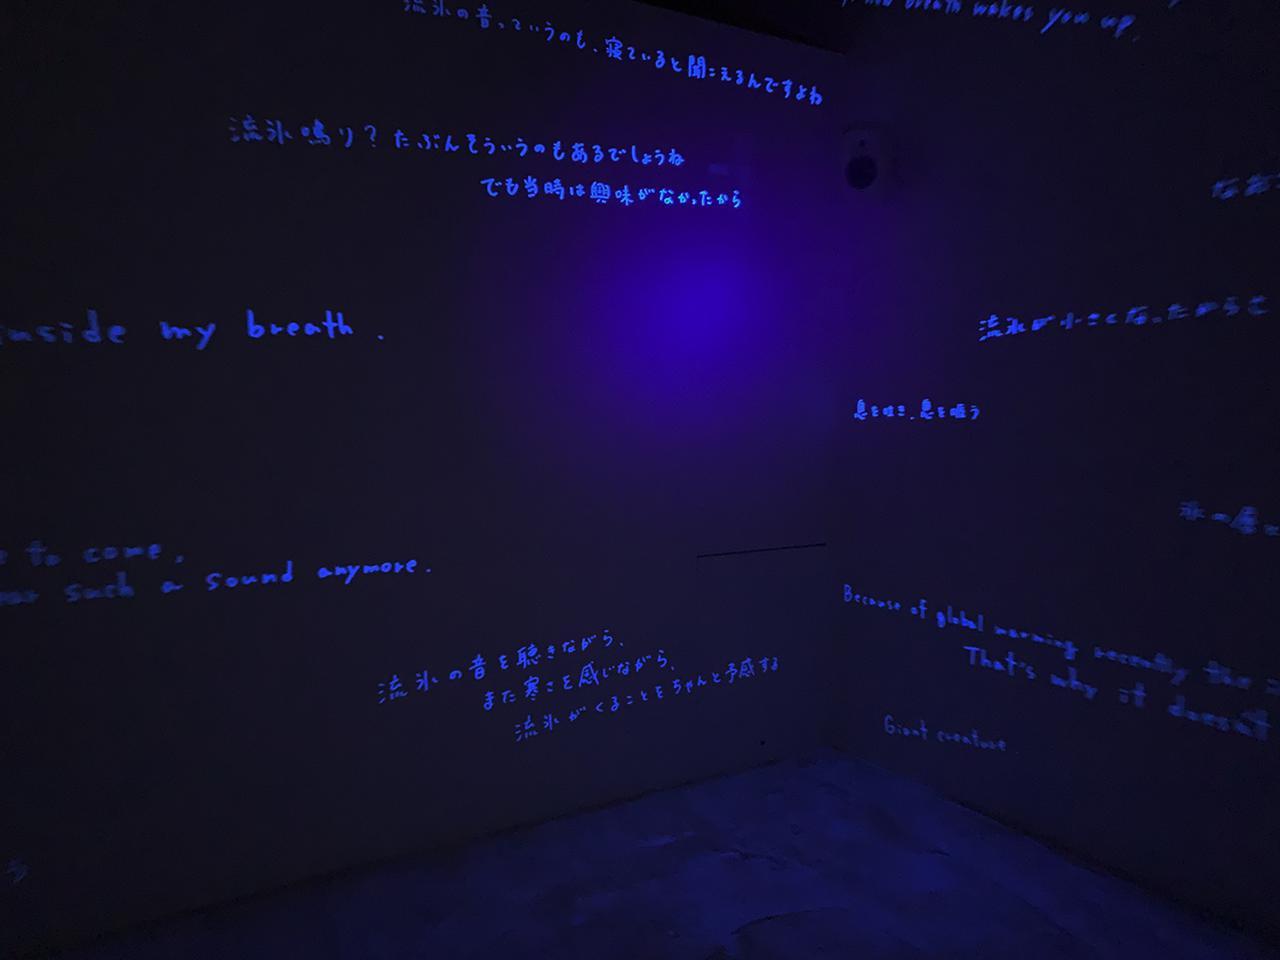 Images : 道草展:未知とともに歩む|水戸芸術館 現代美術ギャラリー